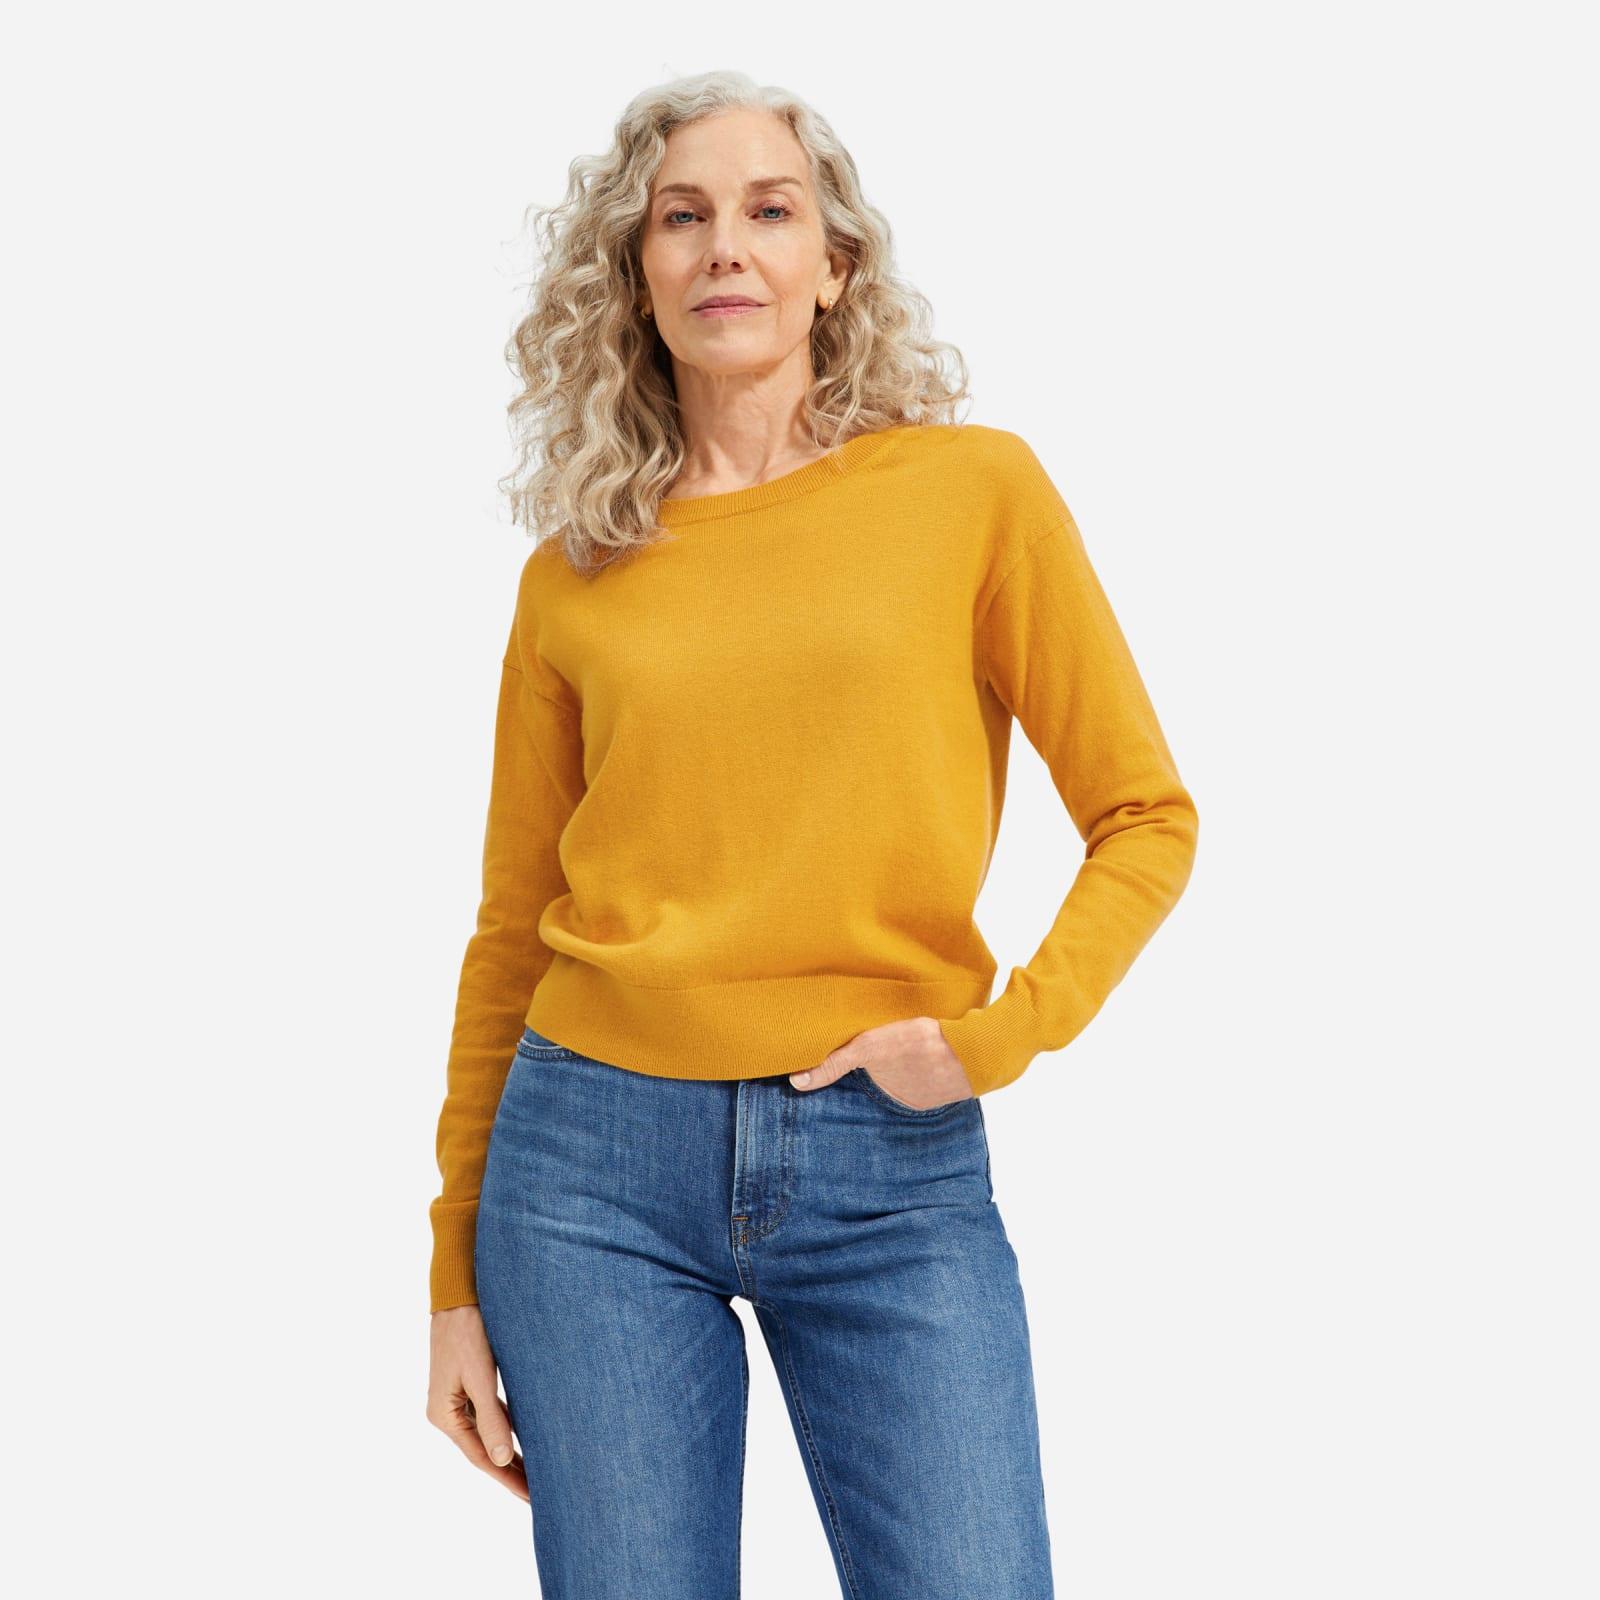 cotton–merino crew by everlane in marigold, size xxs